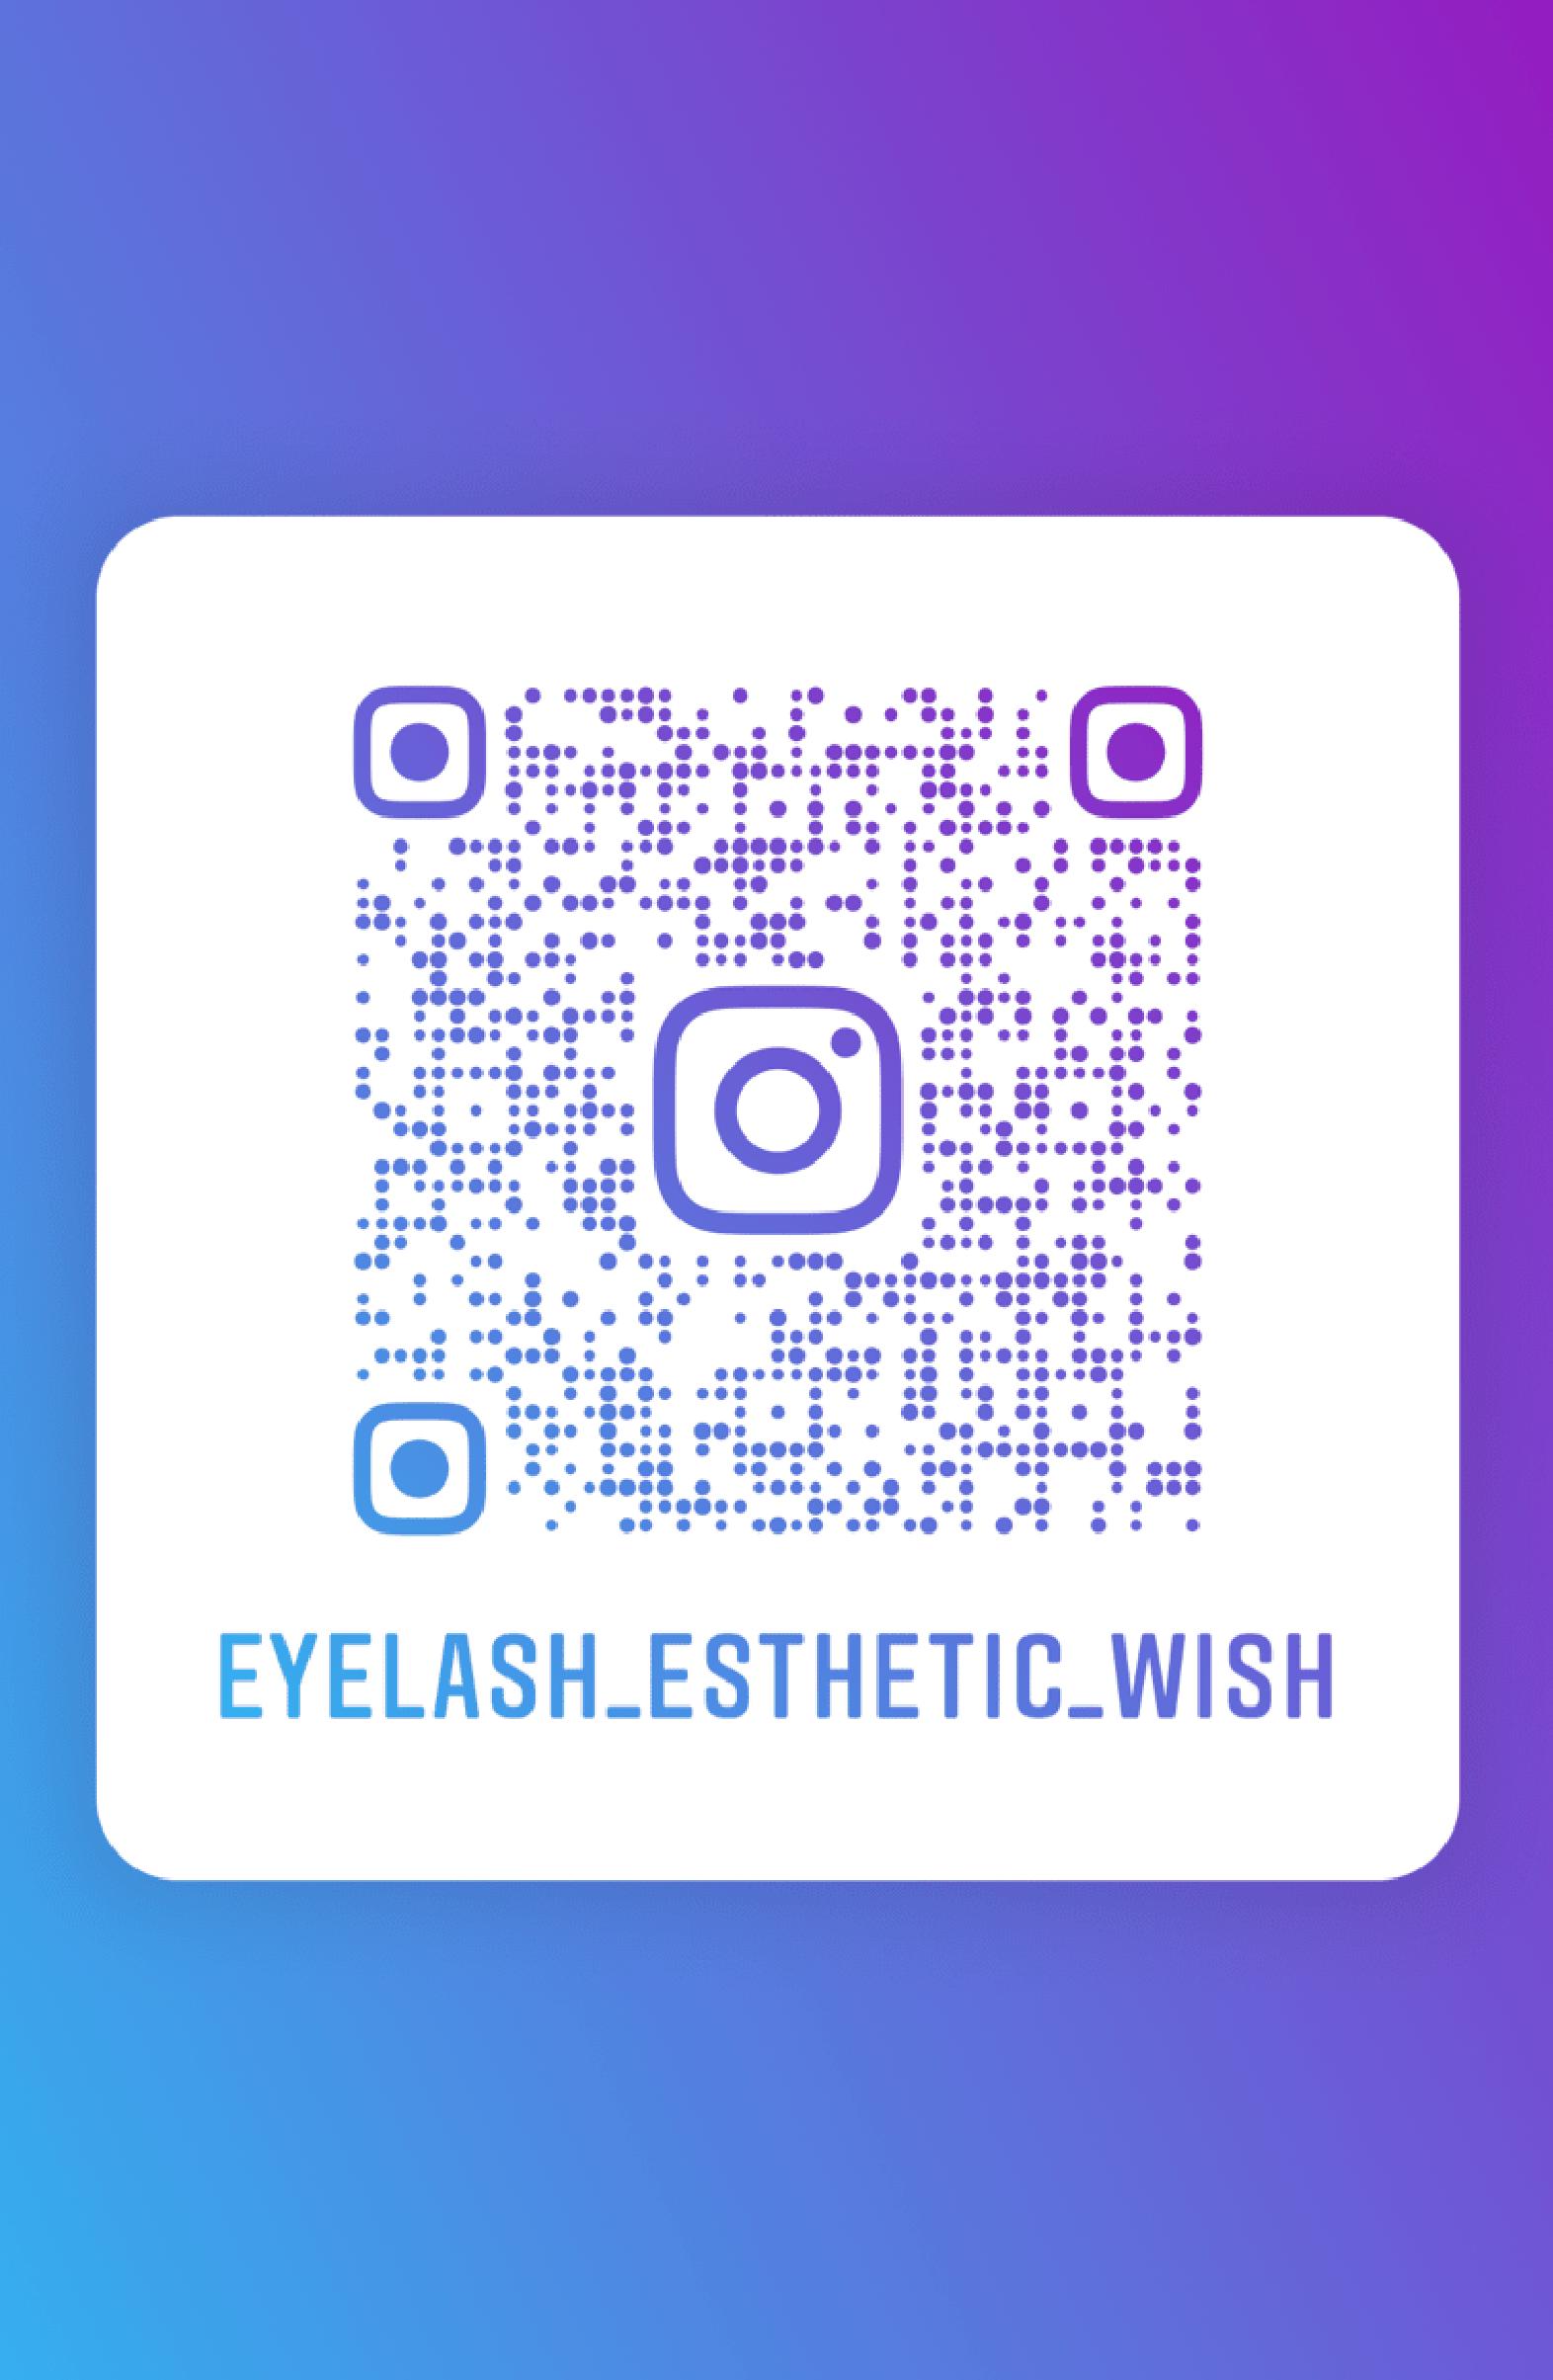 insta01 アートボード 1 - Eyelash&Esthetic Wish